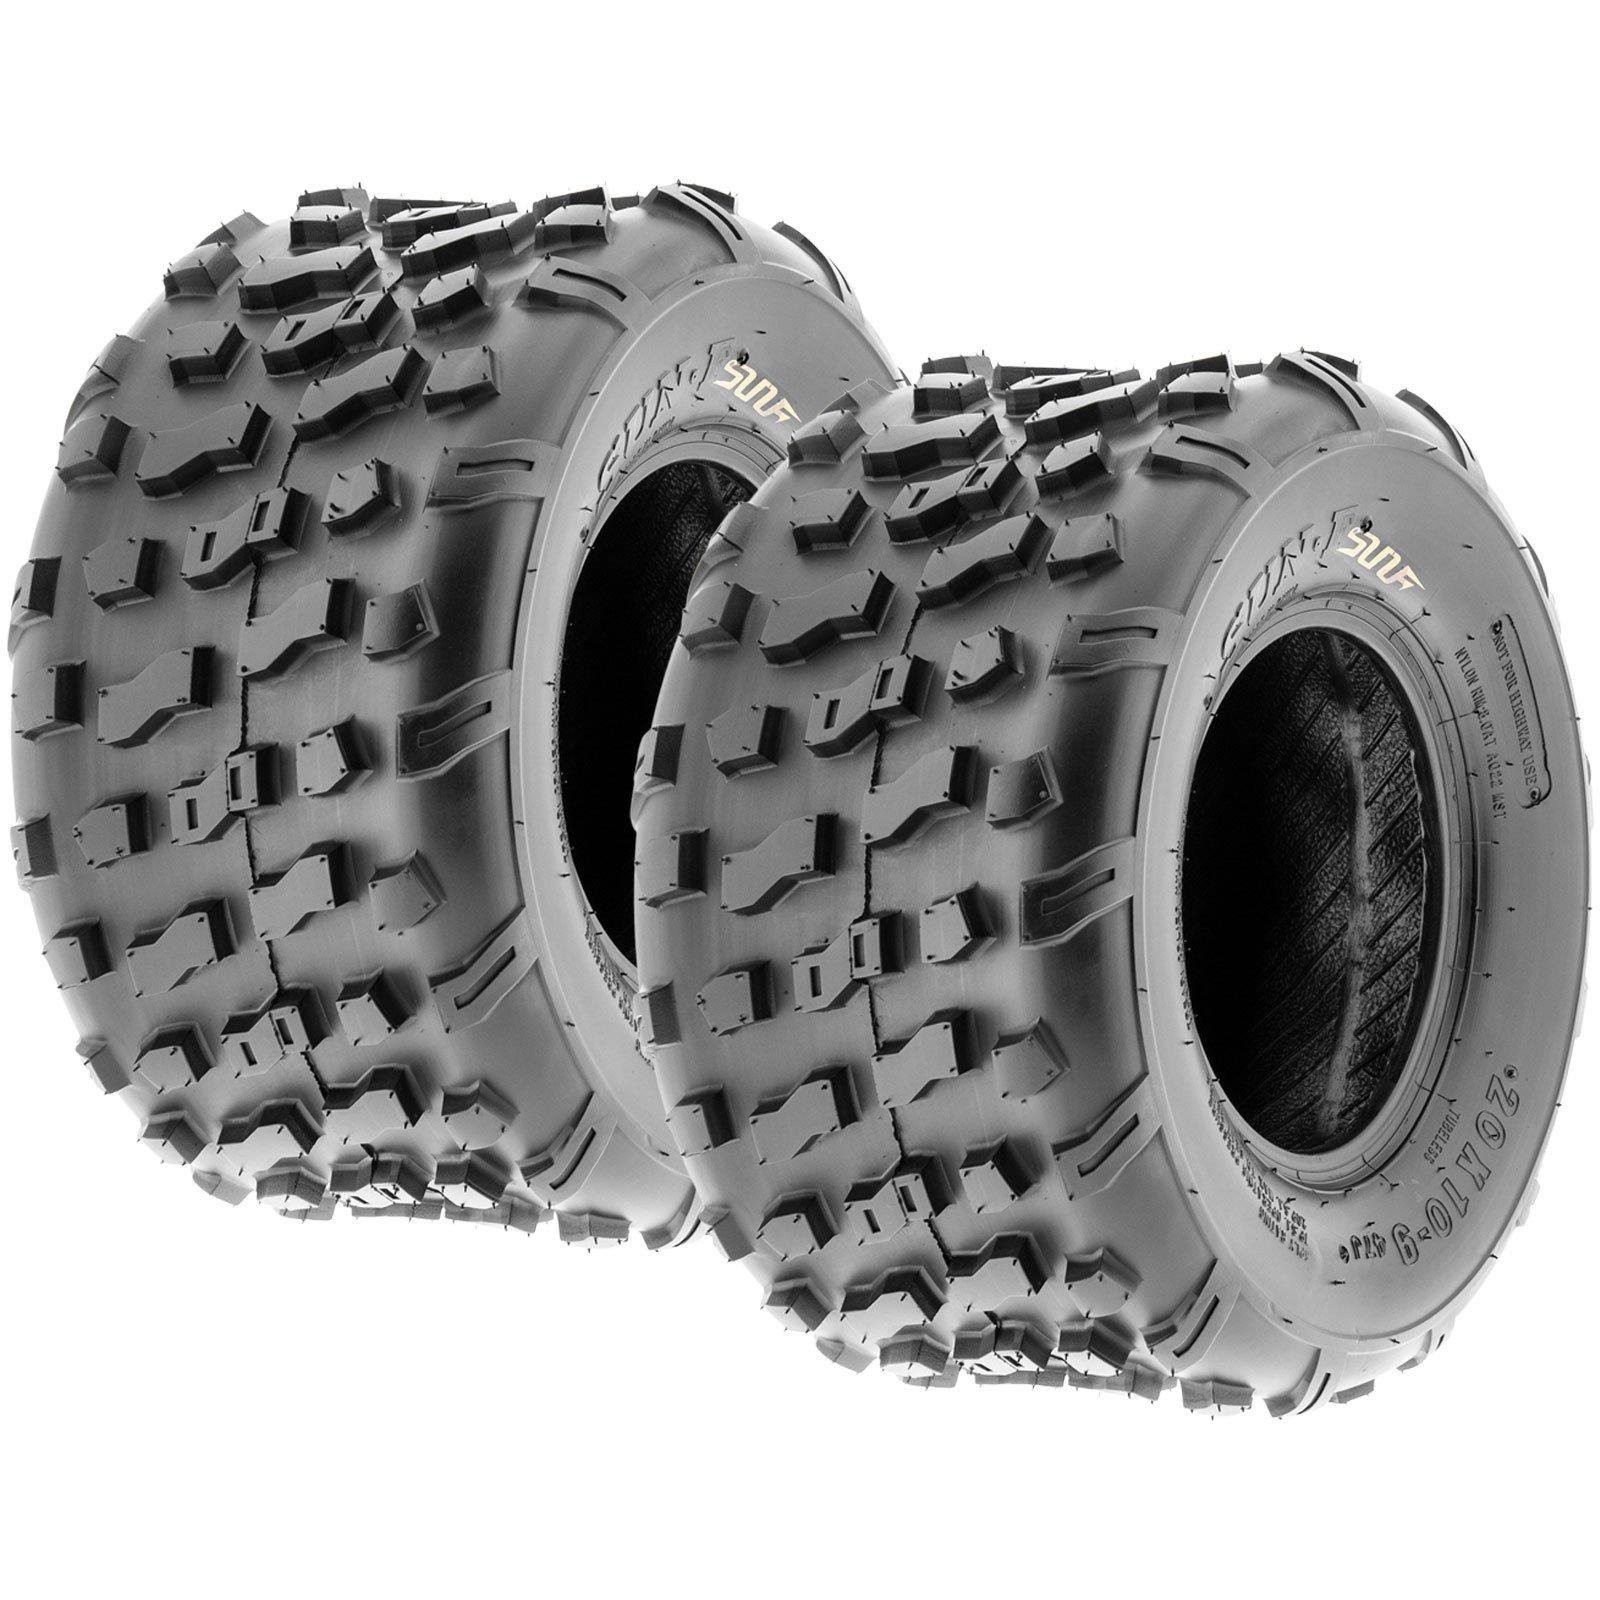 Set of 2 SunF 20x10-9 20x10x9 ATV UTV Knobby Rear Tire 4 Ply A022